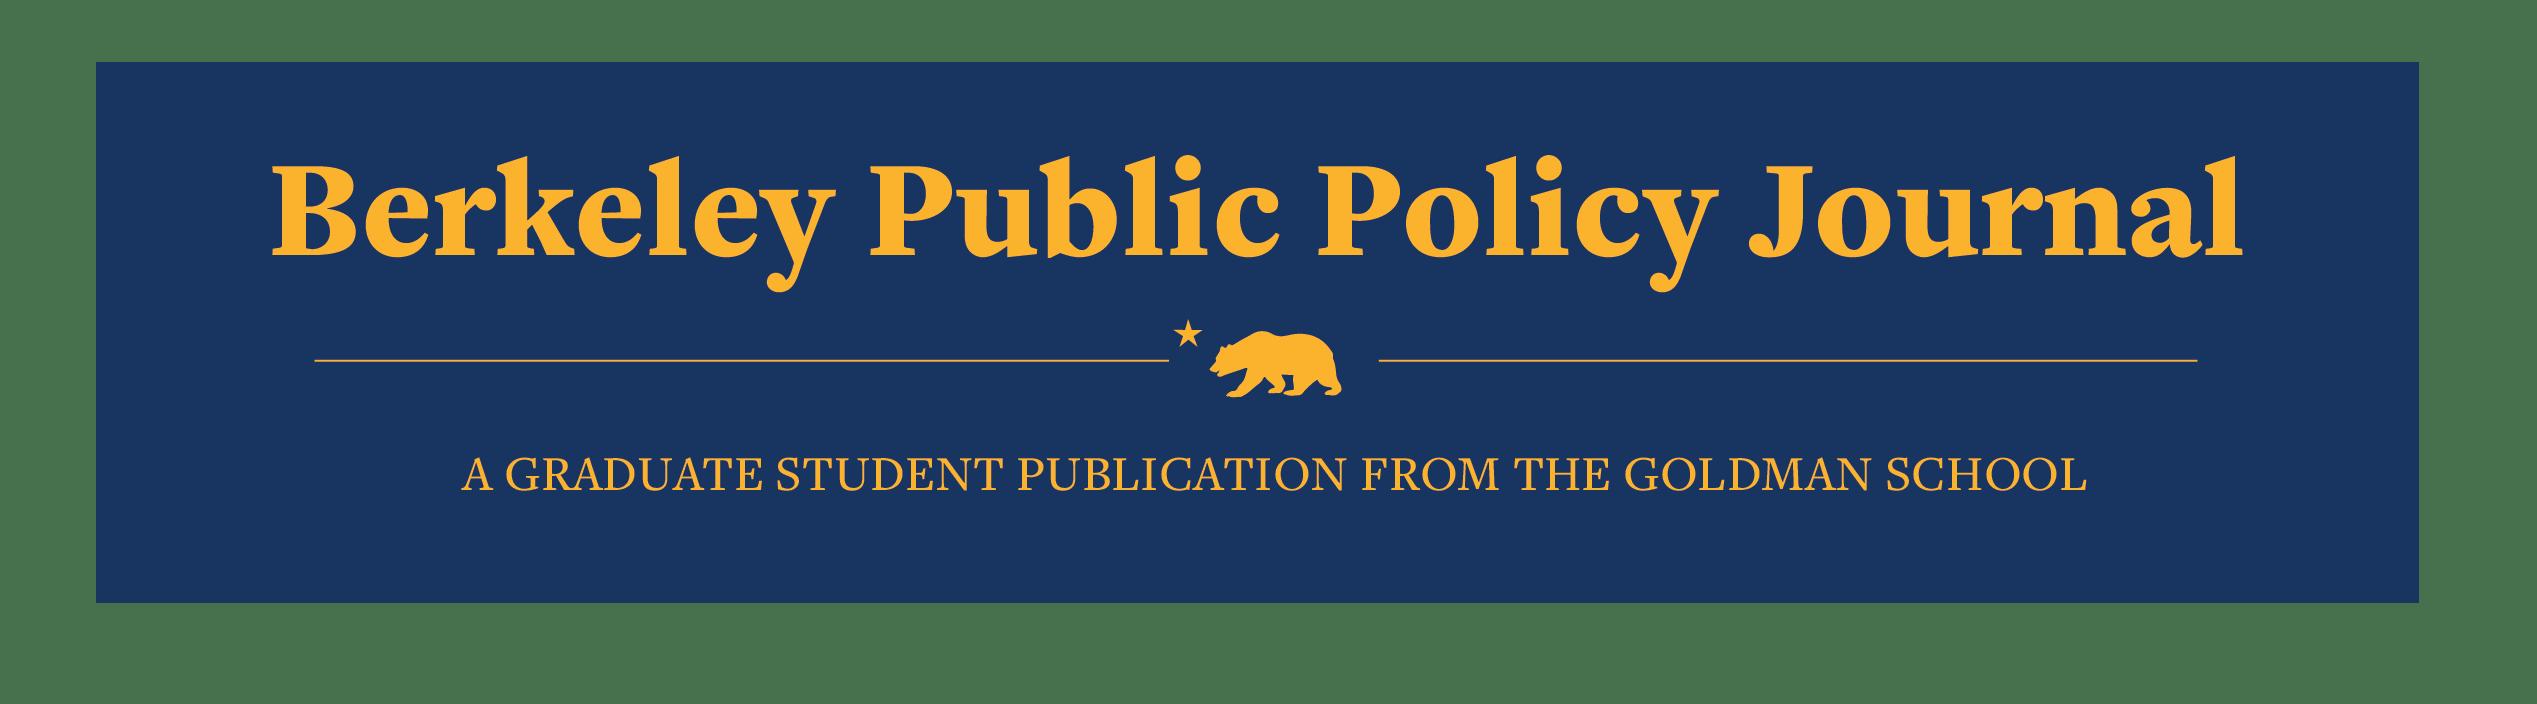 BPPJ Design Consultation Updated 4-09